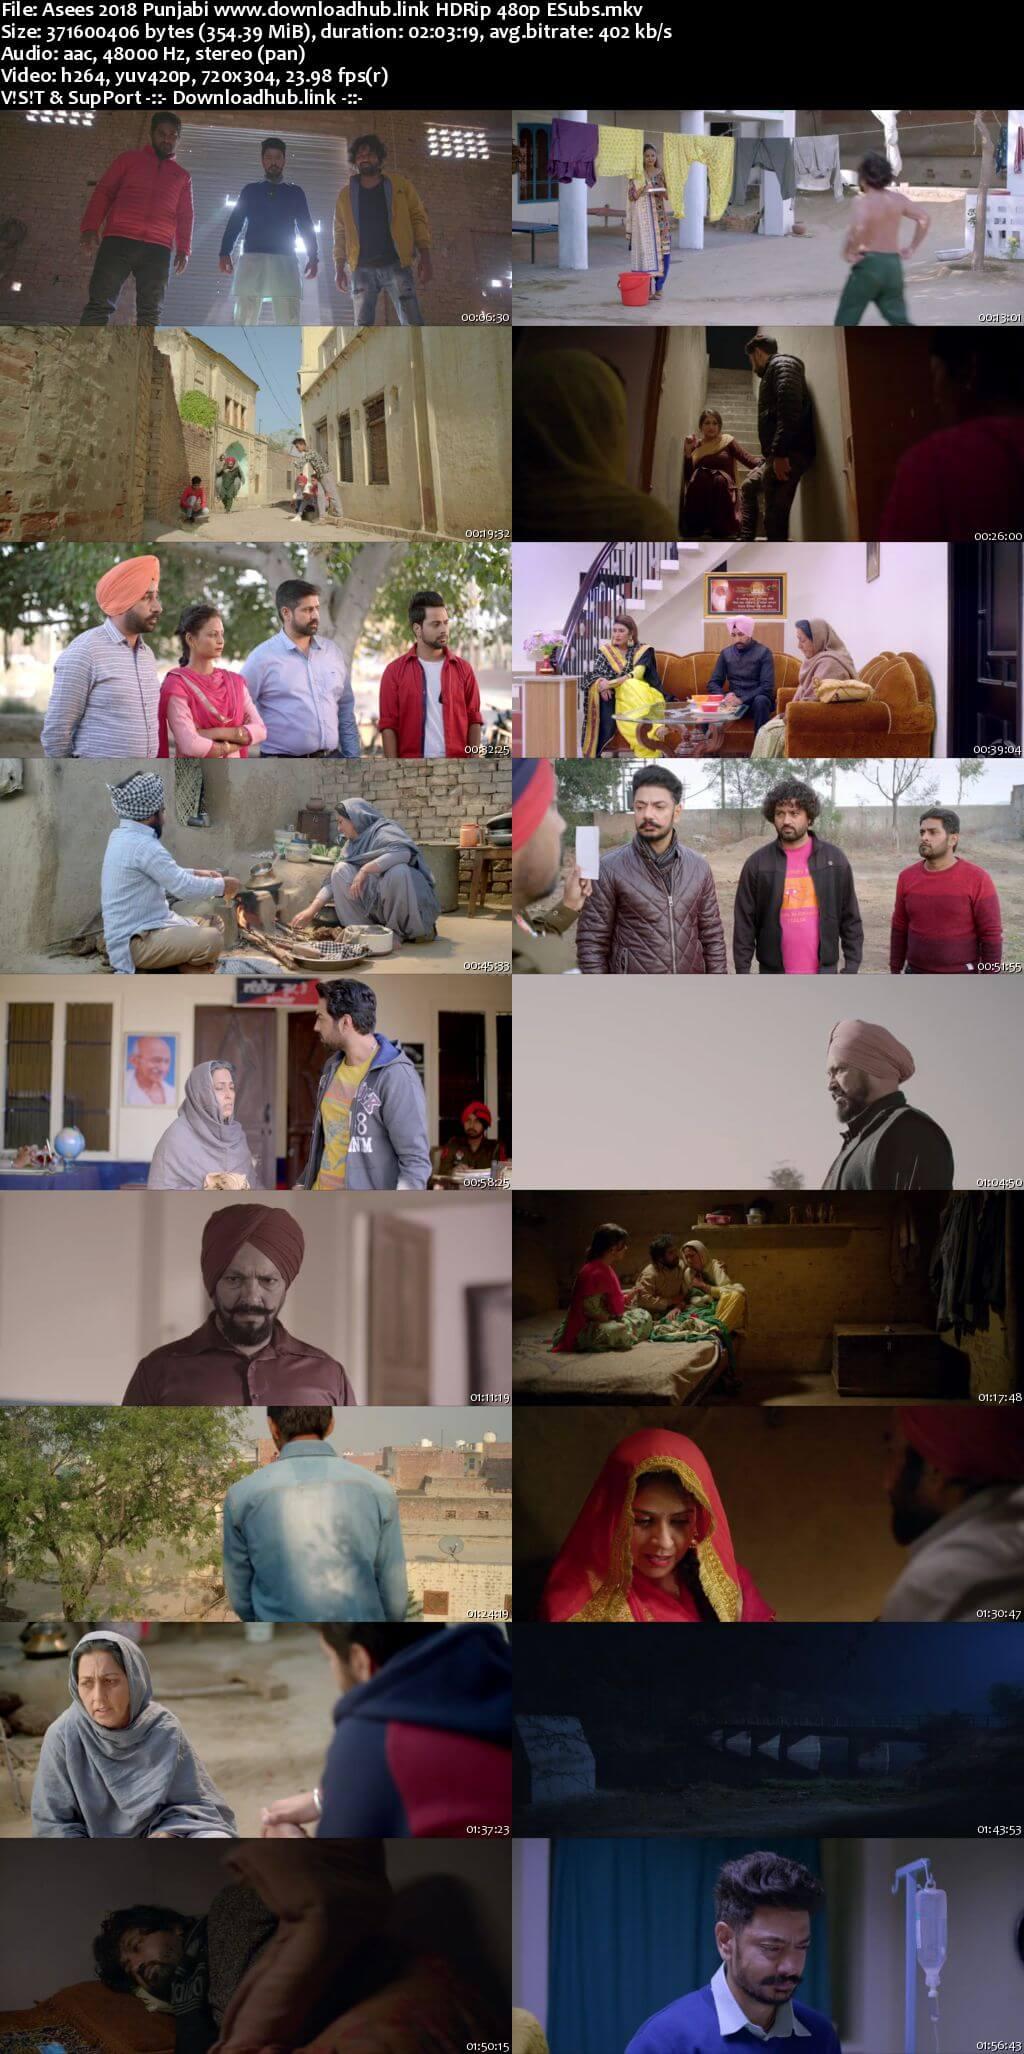 Asees 2018 Punjabi 350MB HDRip 480p ESubs